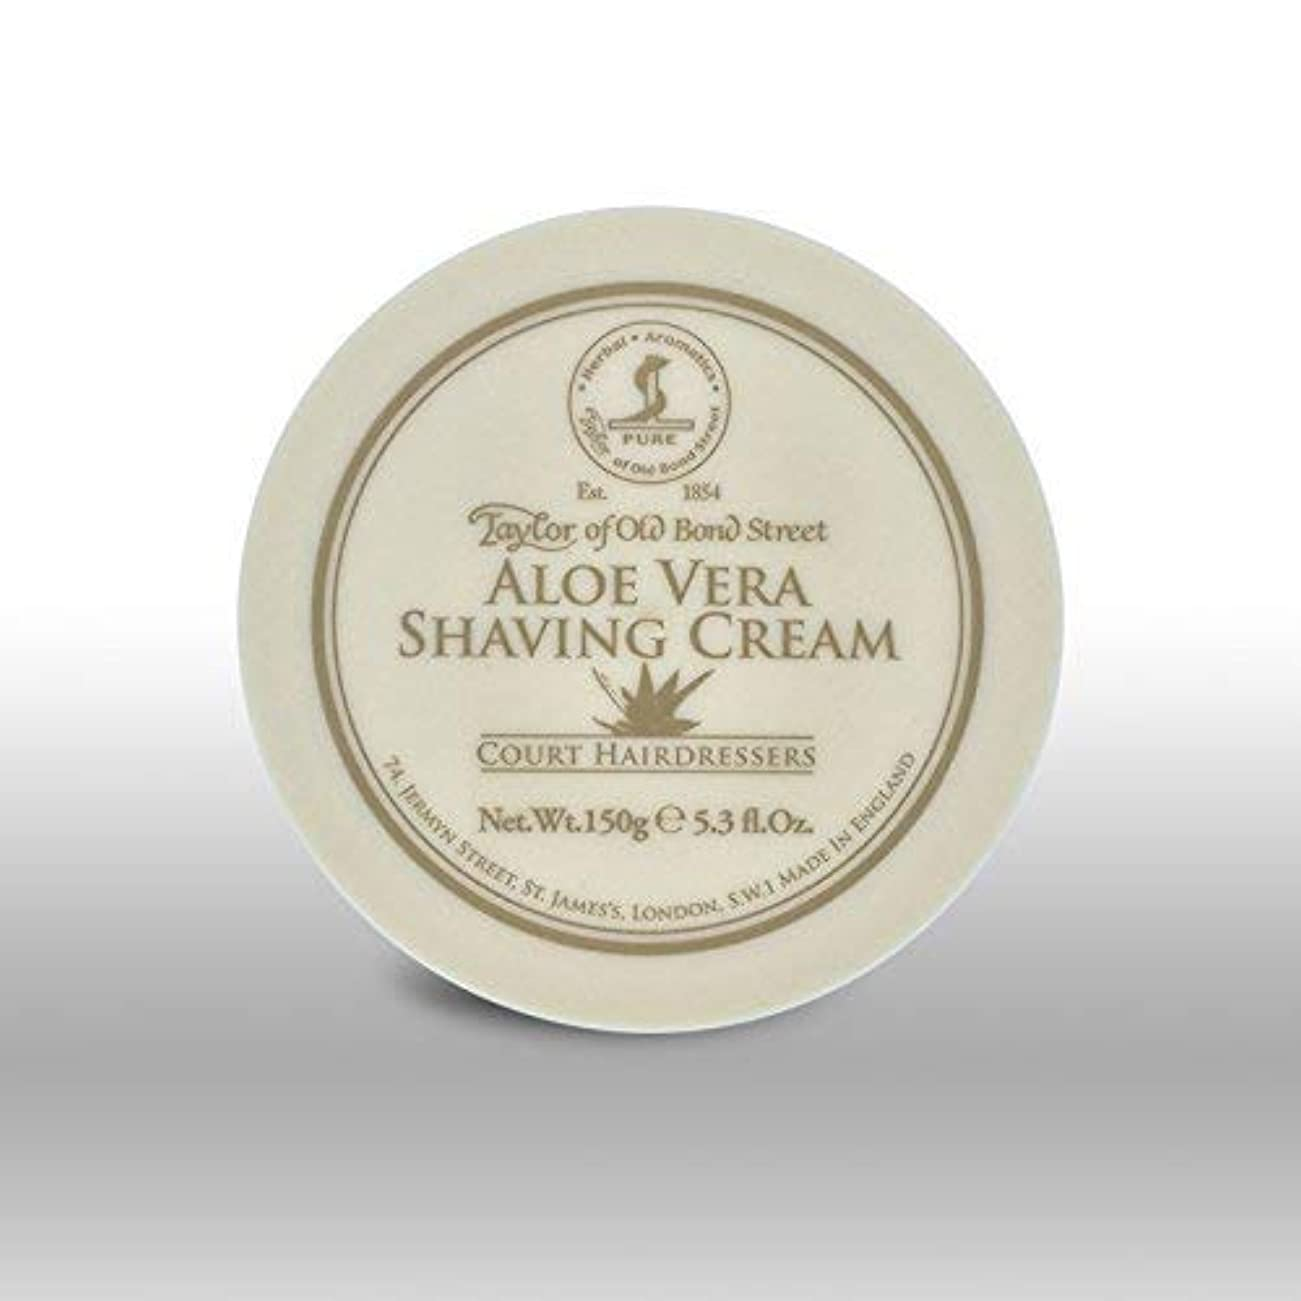 起点供給繁栄Taylor Of Old Bond Street Shaving Cream Pot 150g -Aloe Vera [並行輸入品]